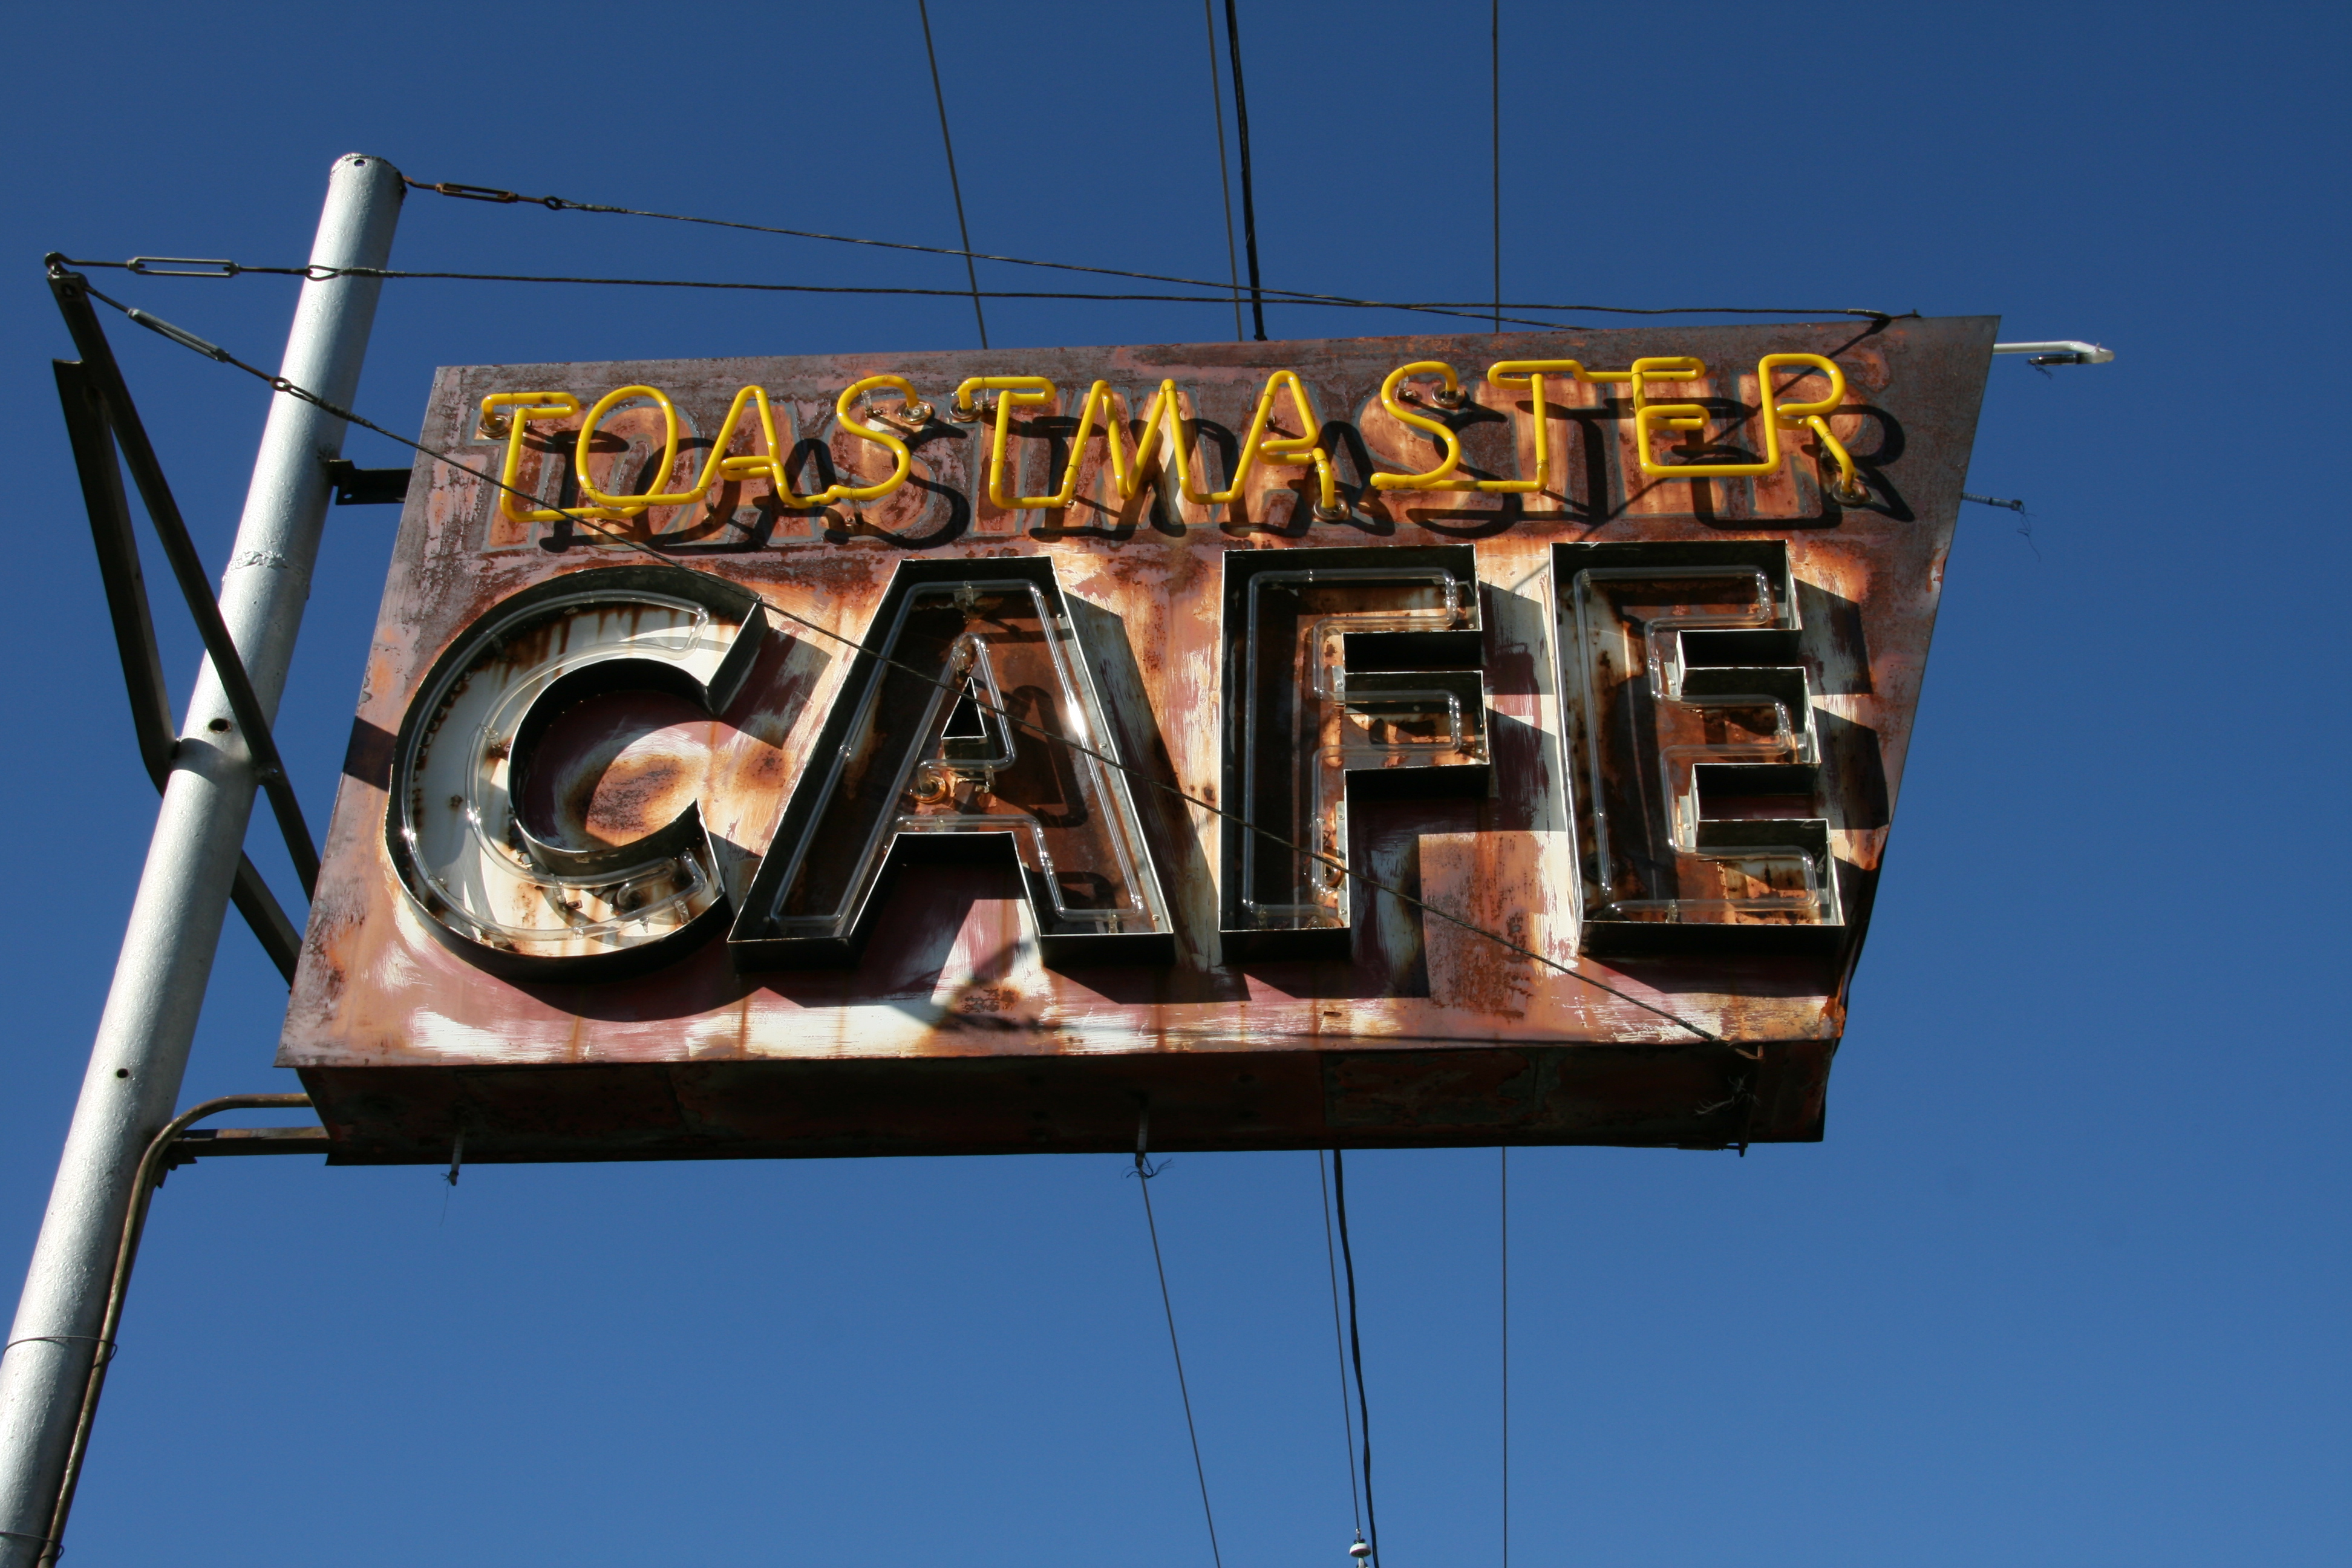 Toastmaster Cafe - Globe, Arizona U.S.A. - October 14, 2008